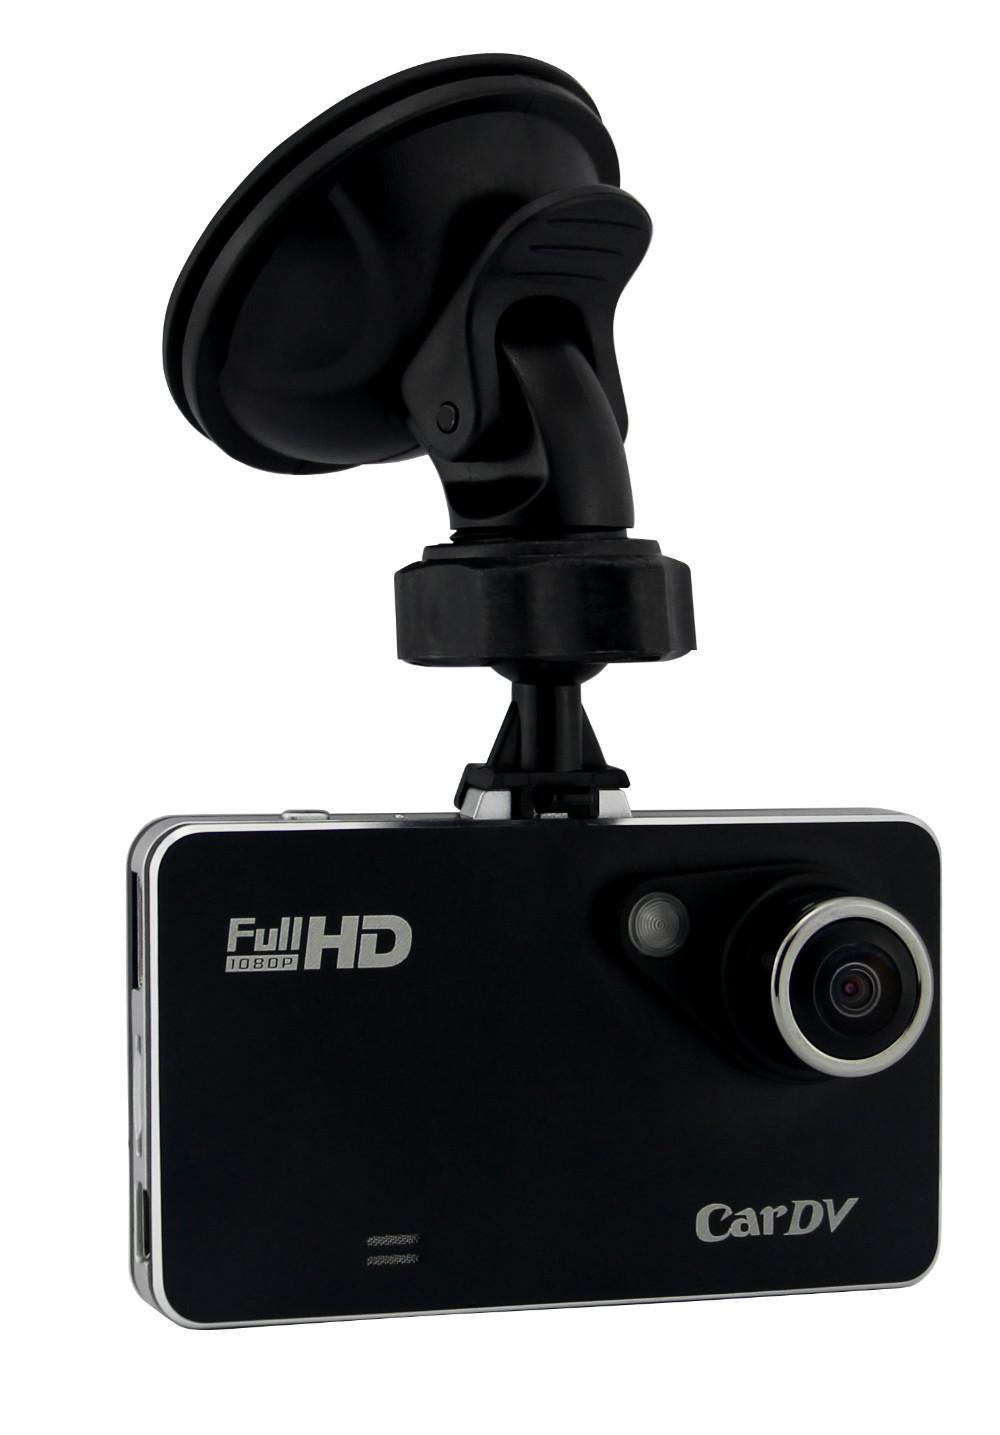 "Car DVR Video Recorder G20L NTK96220 Full hd 1080P 2.7""LCD+G-Sensor+Motion Detection Video Recorder Dash Cam black box(China (Mainland))"